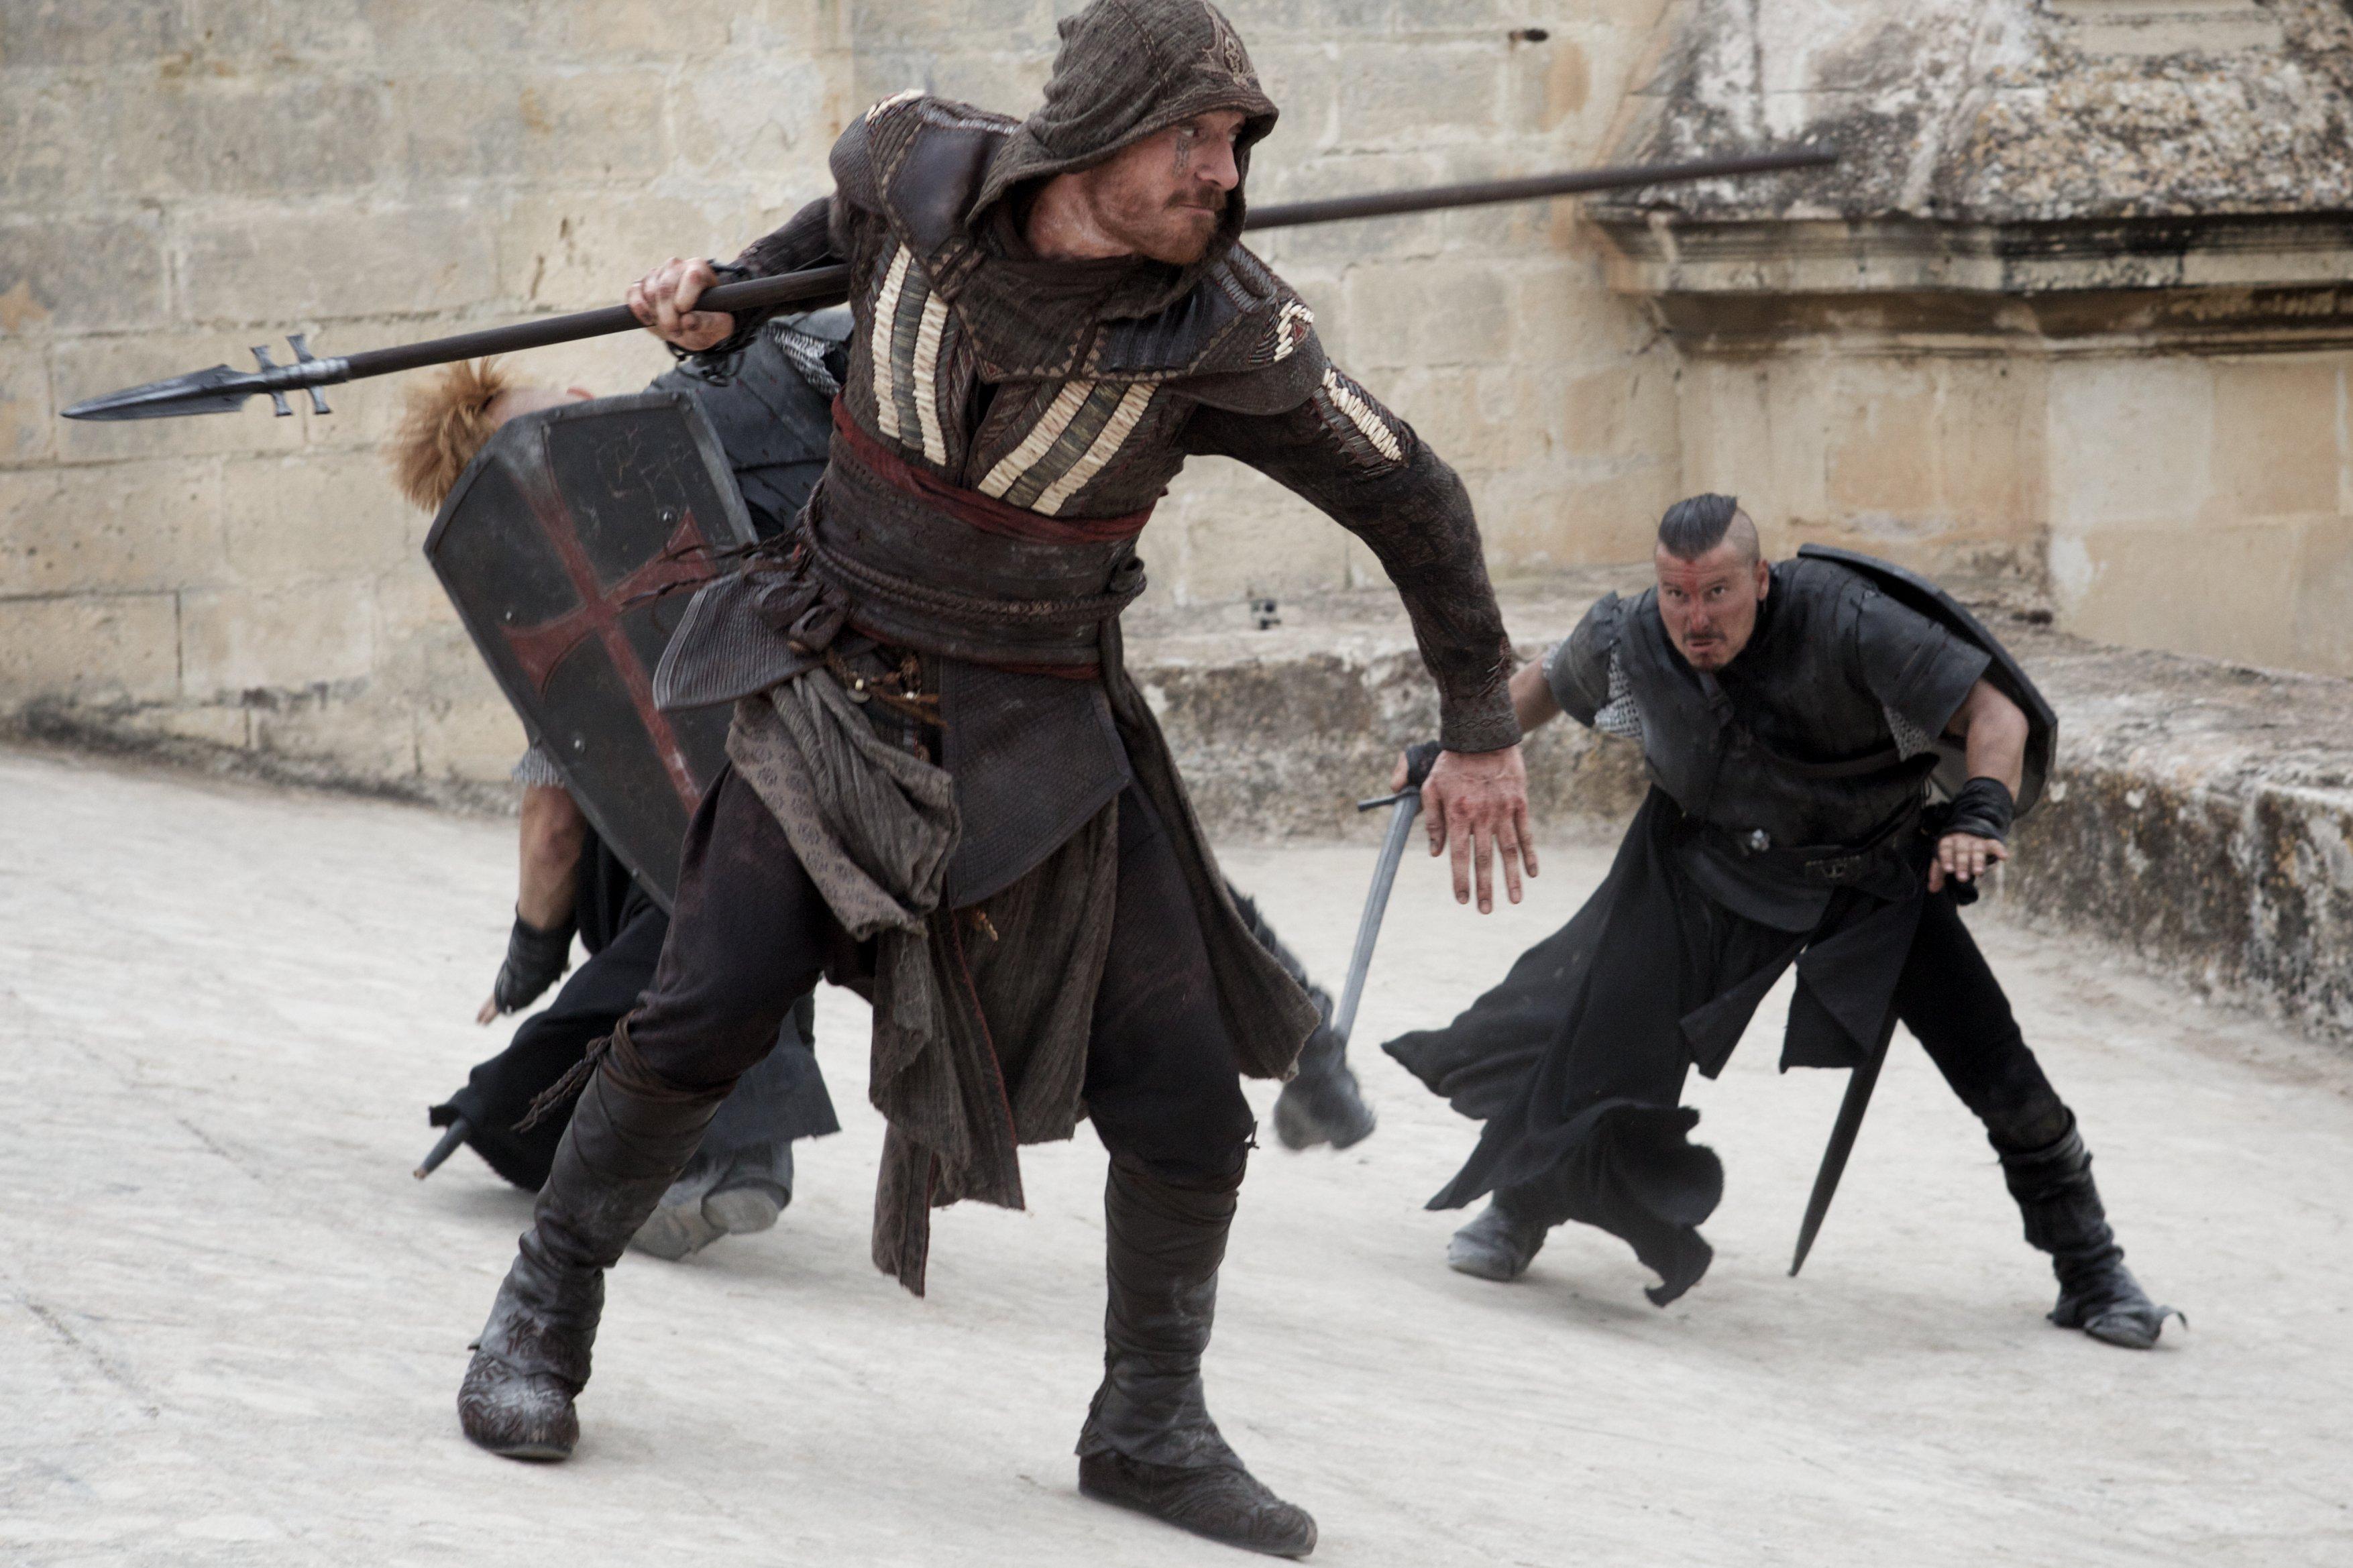 Review - Assassin's Creed - Still 2